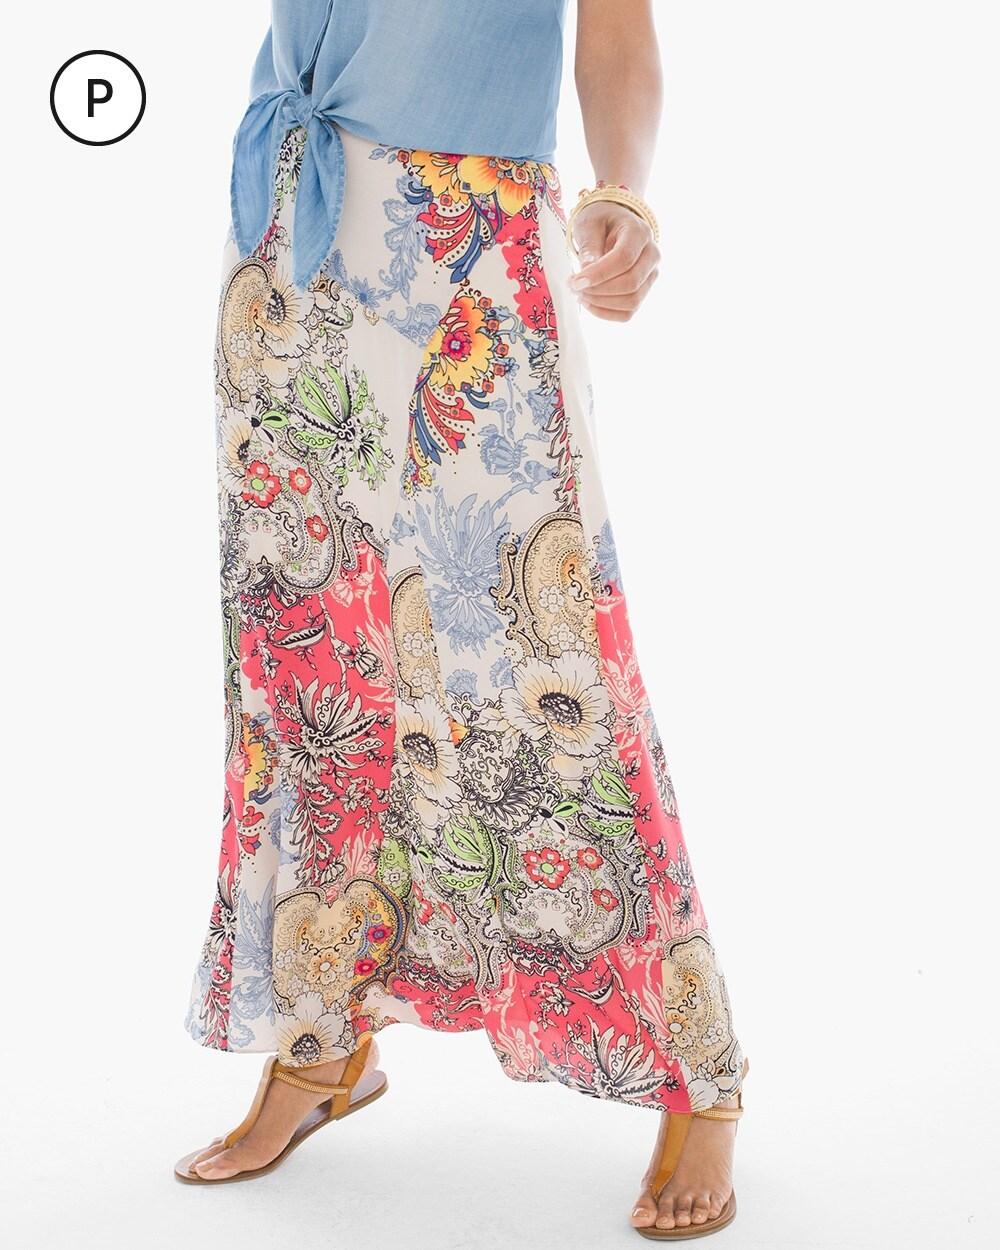 Petite Patchwork Floral Maxi Skirt - Chicos